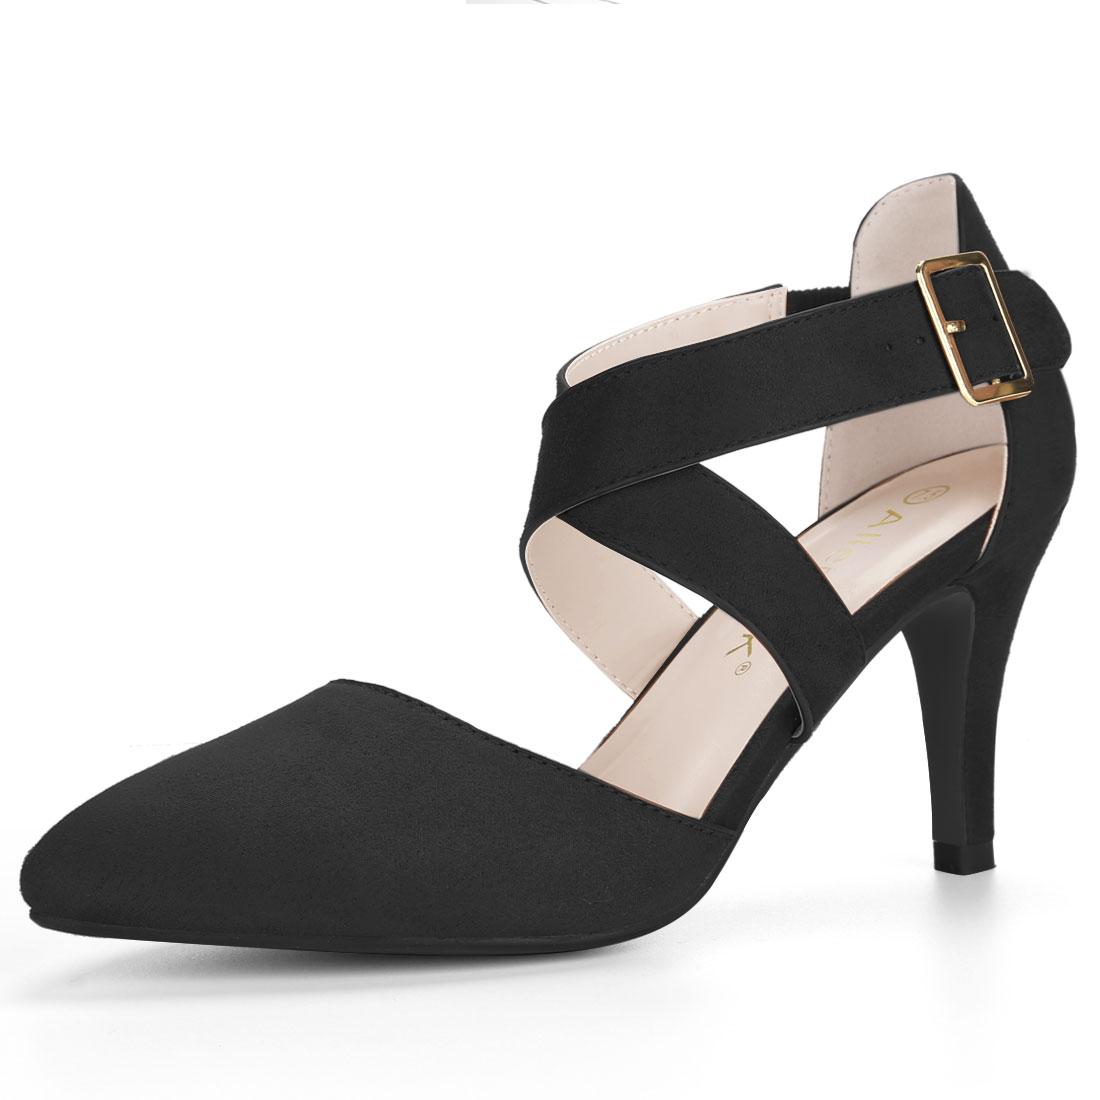 Allegra K Women's Crisscross Straps Stiletto Heel Ankle Strap Pumps Black US 7.5